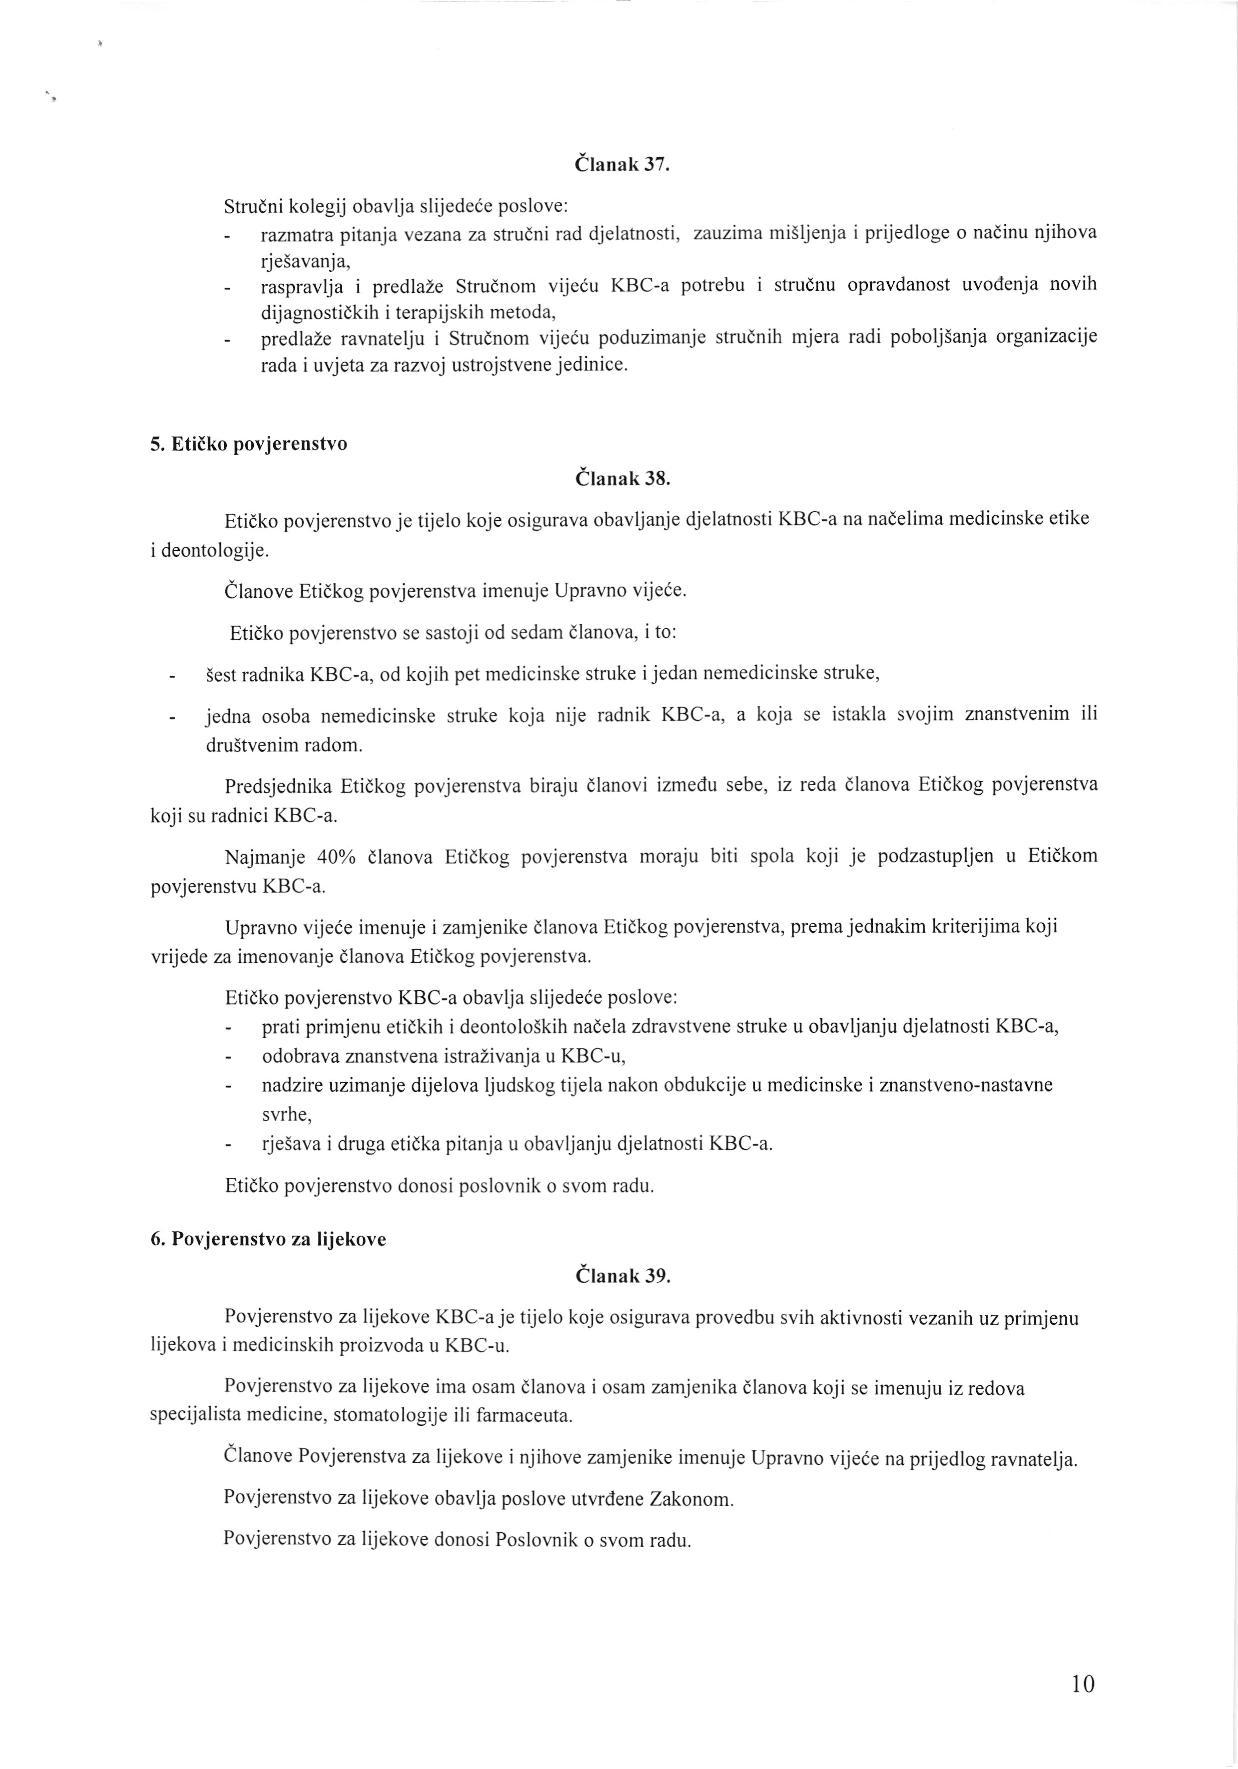 Statut-page-010